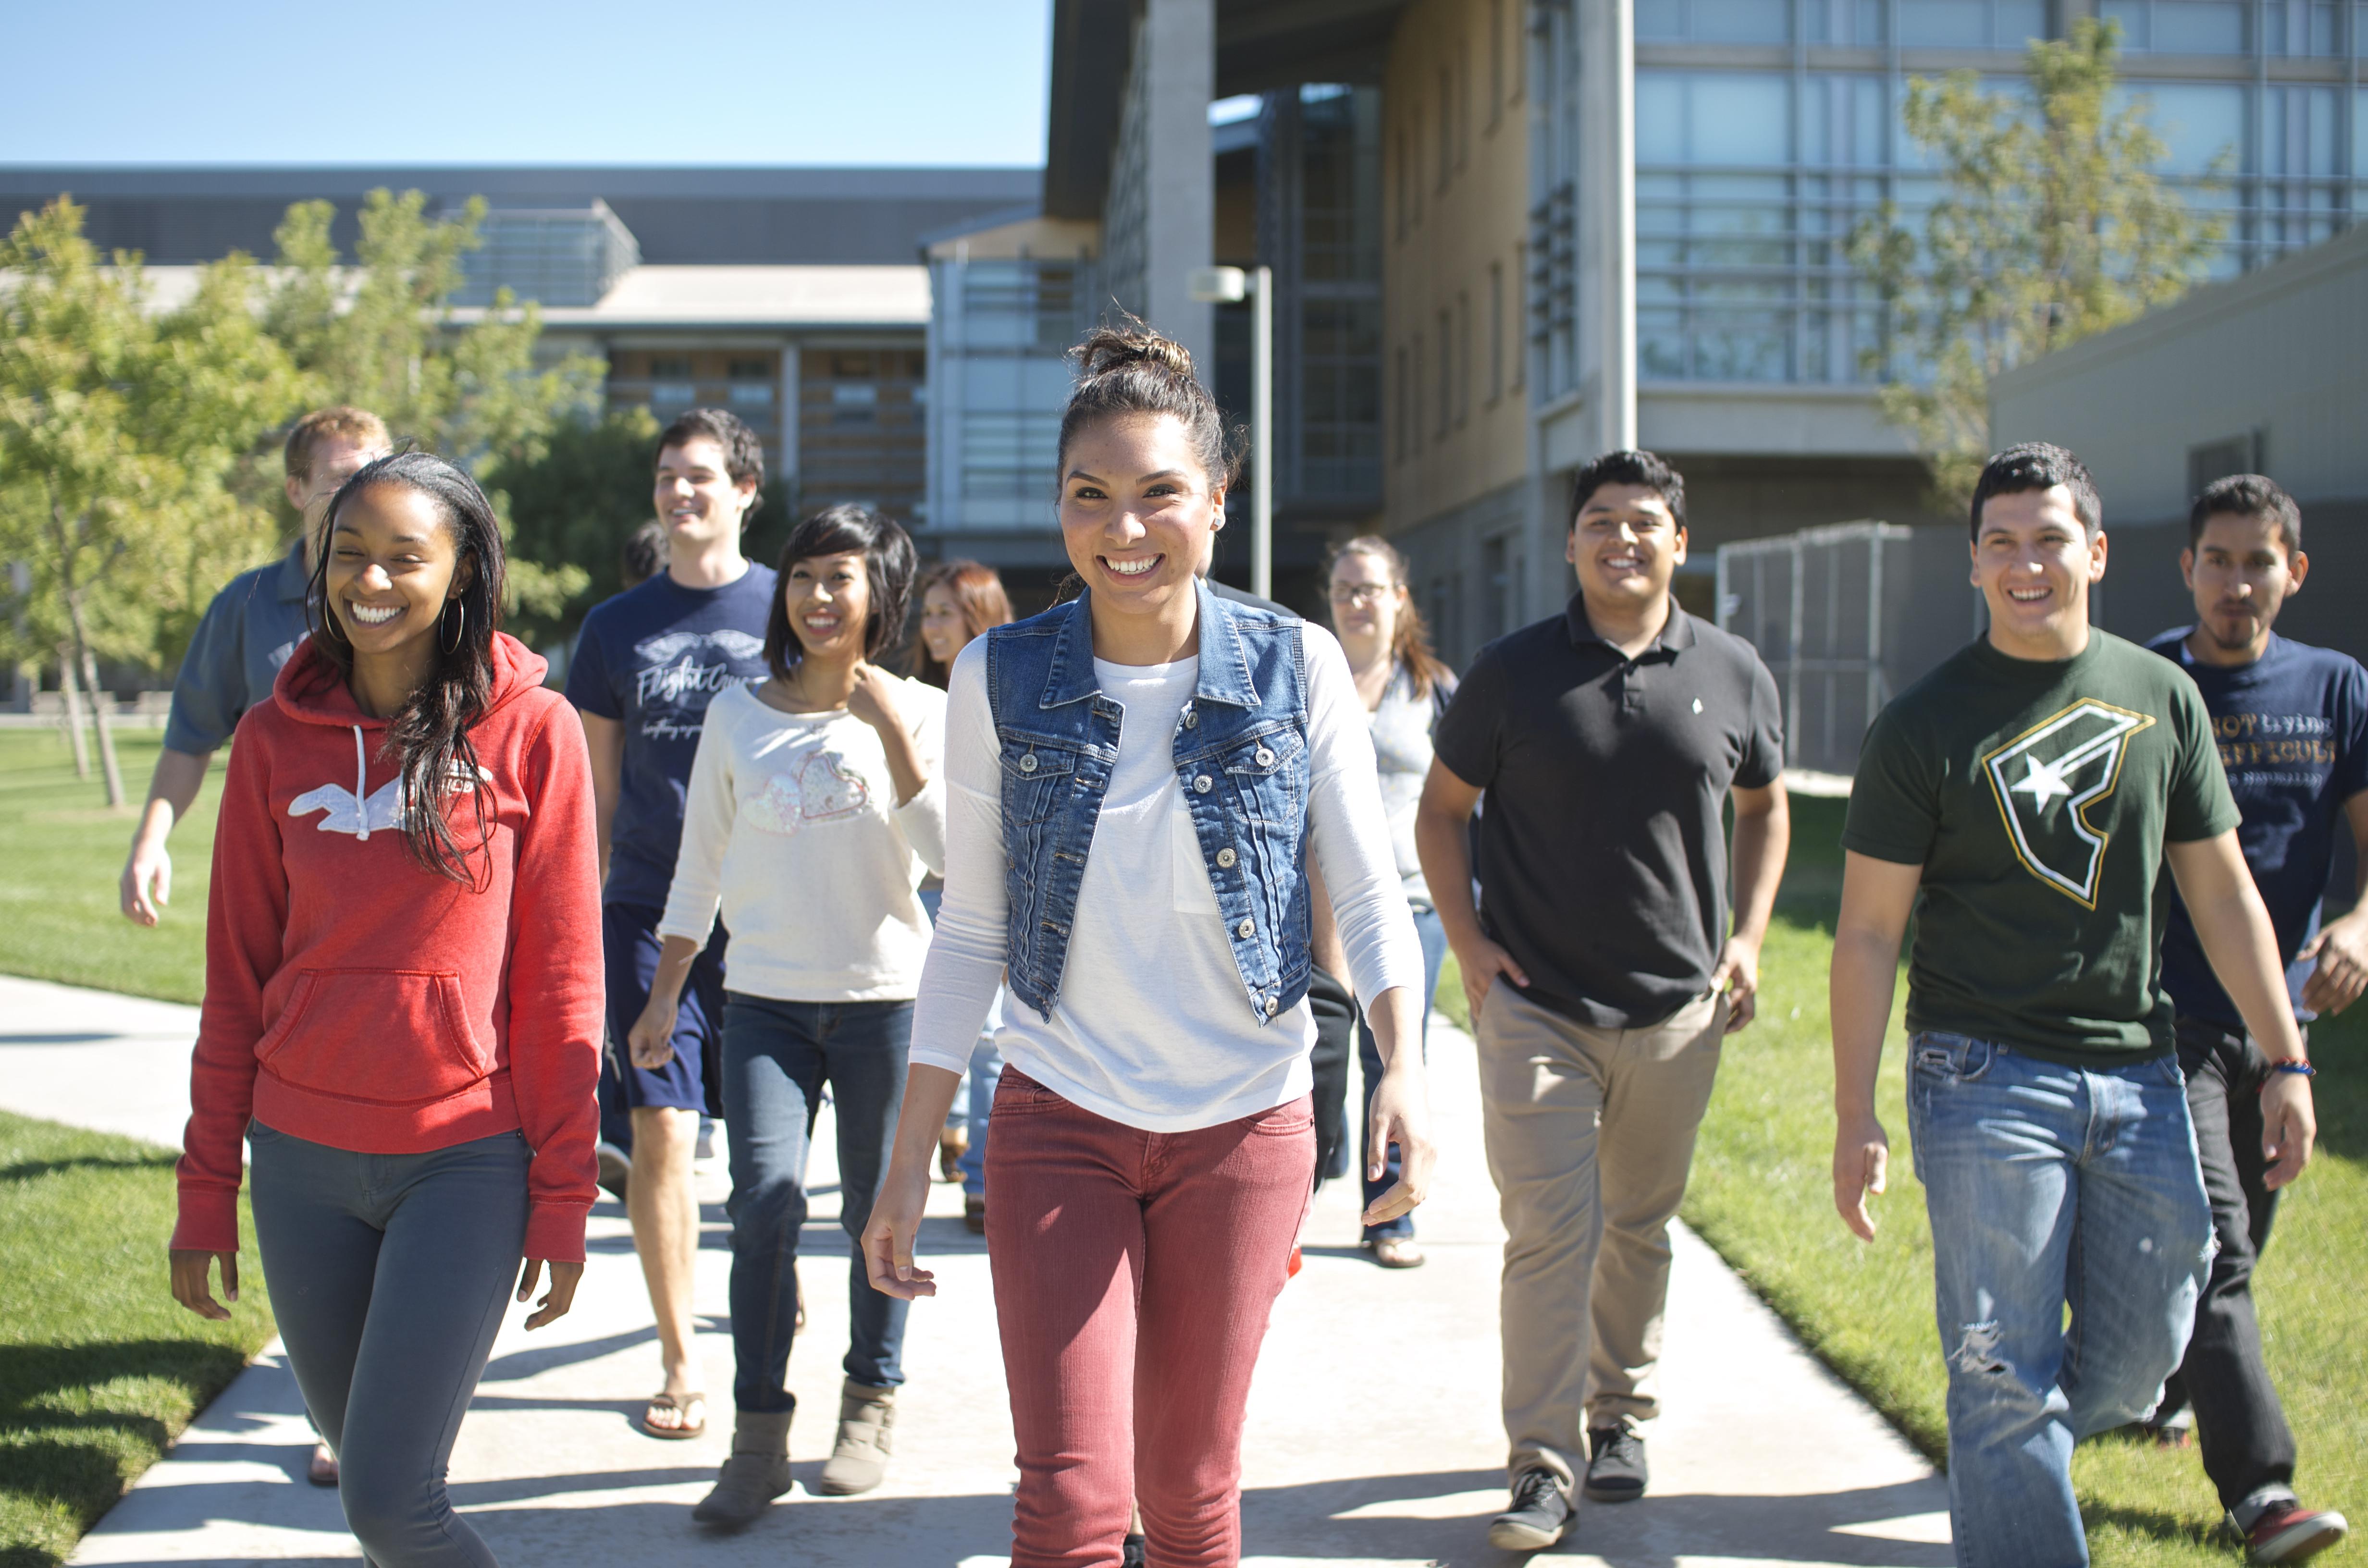 UC Merced students walking through campus